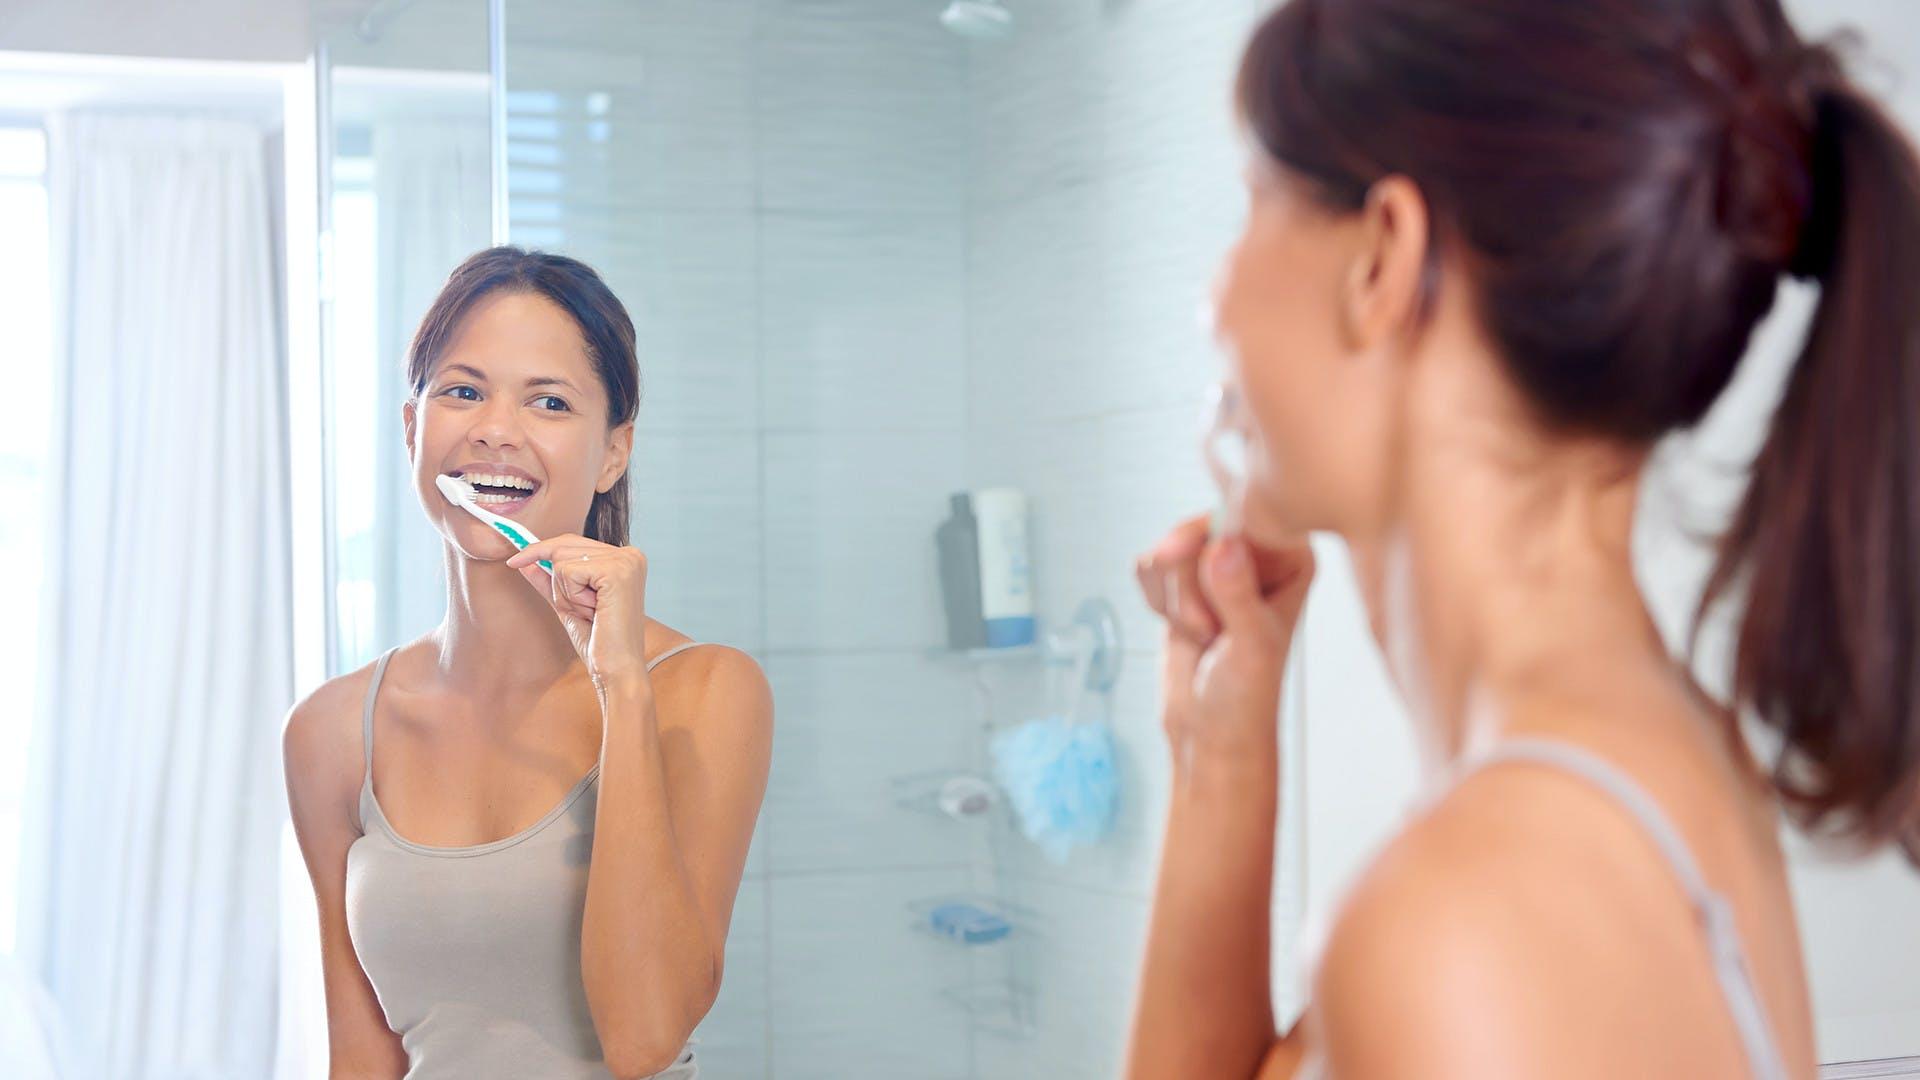 Žena, která si súsměvem čistí zuby